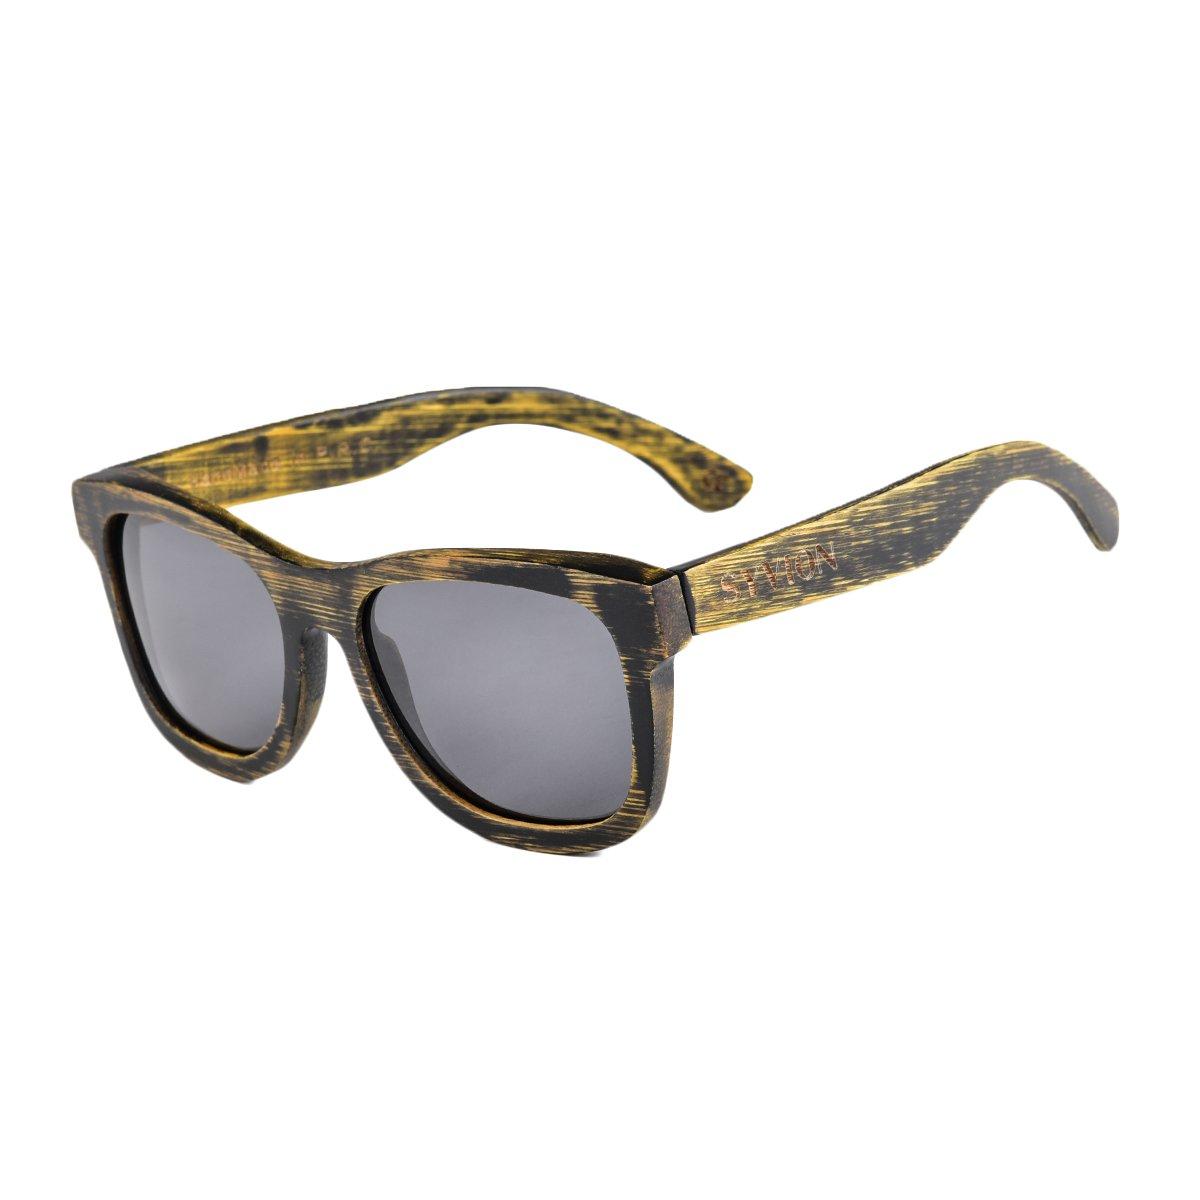 Amazon.com: syvion polarizada anteojos de sol de madera para ...